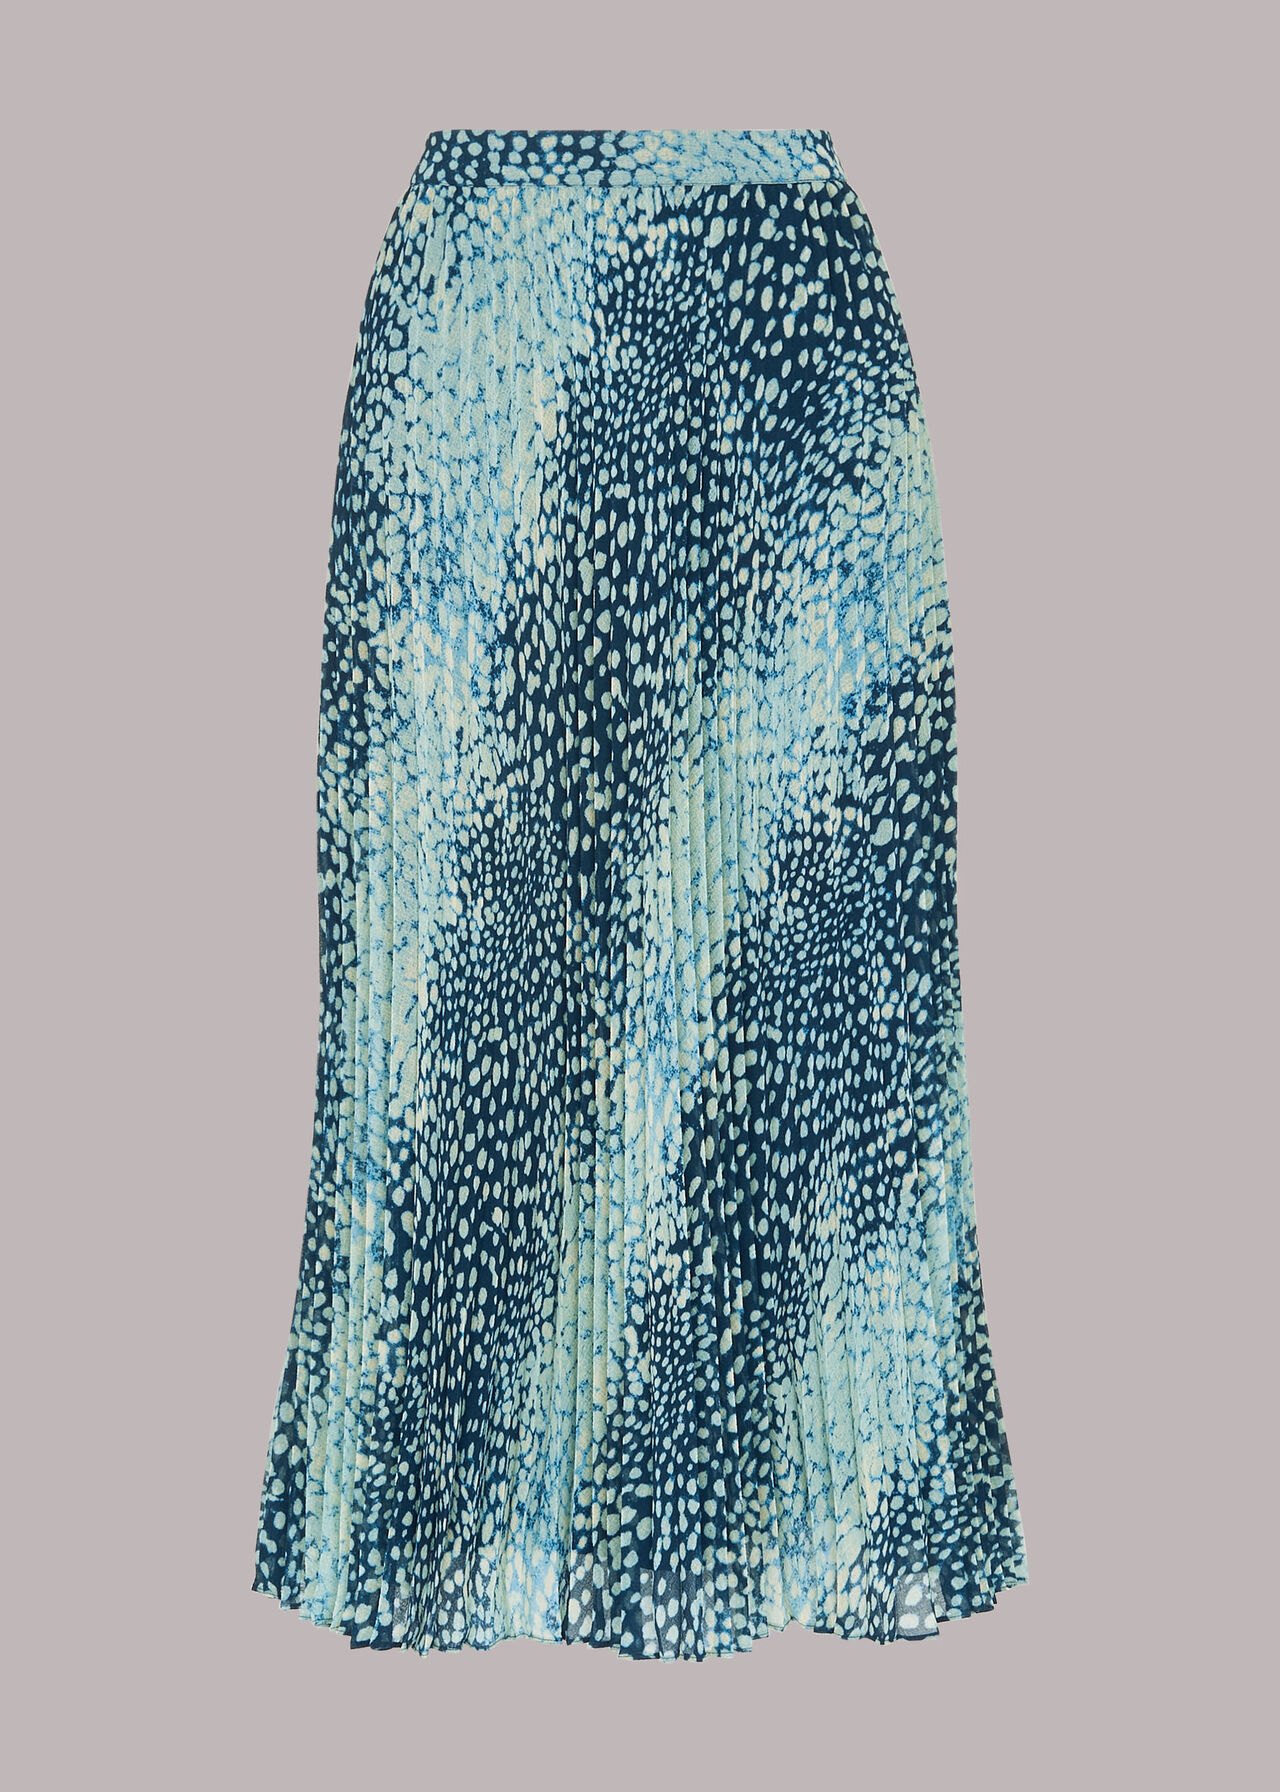 Dalmation Pleated Skirt